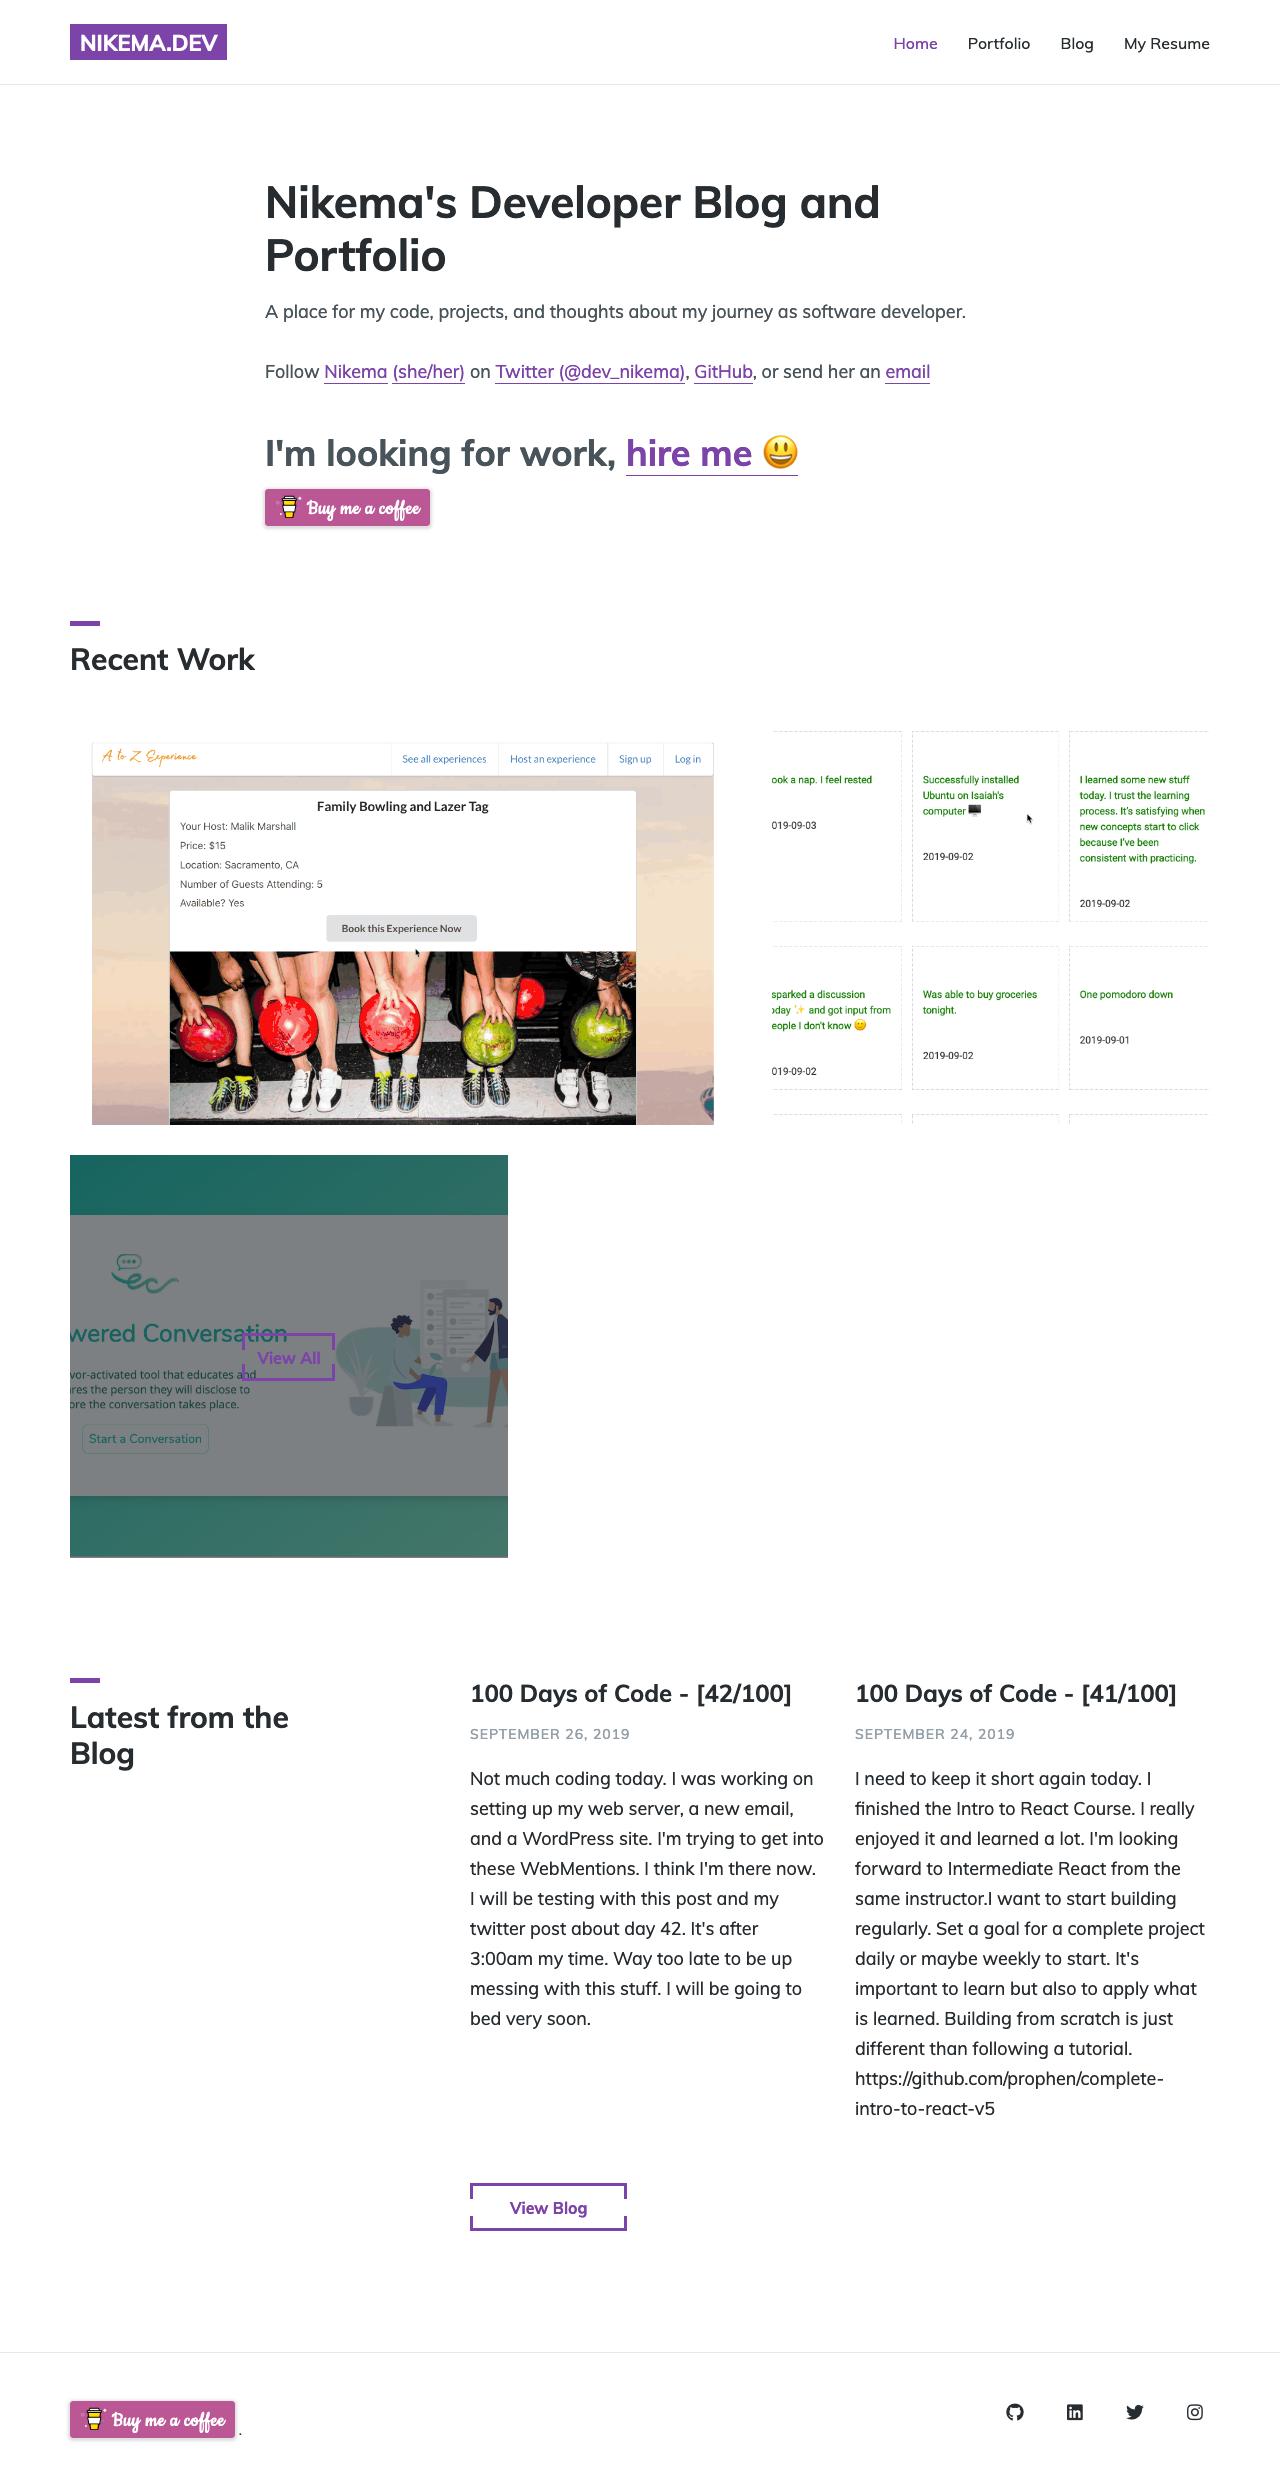 Nikema's Developer Site (old design)